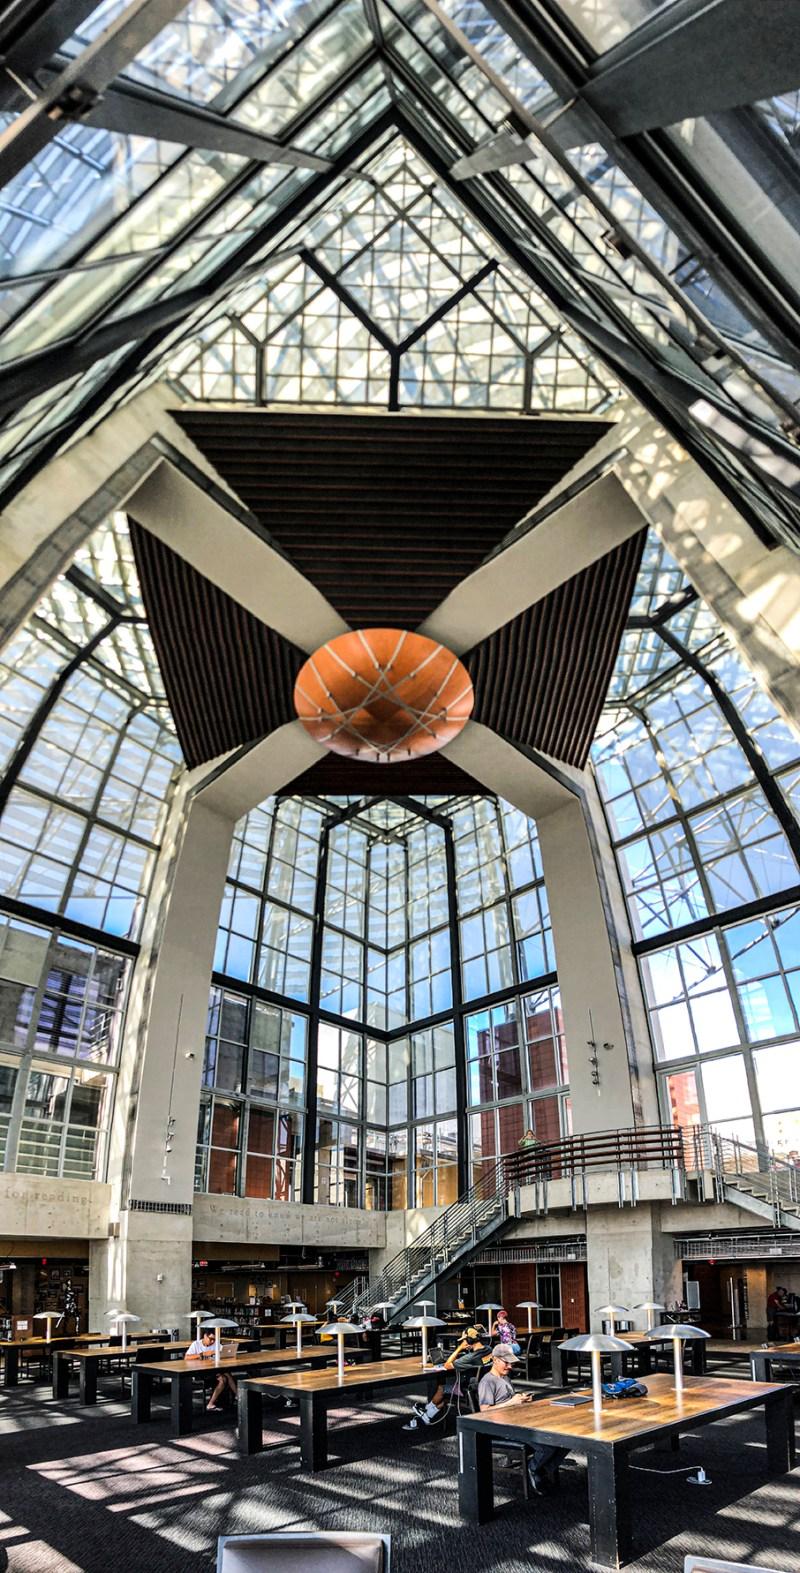 San Diego Public Library - Architect: Rob Quigley